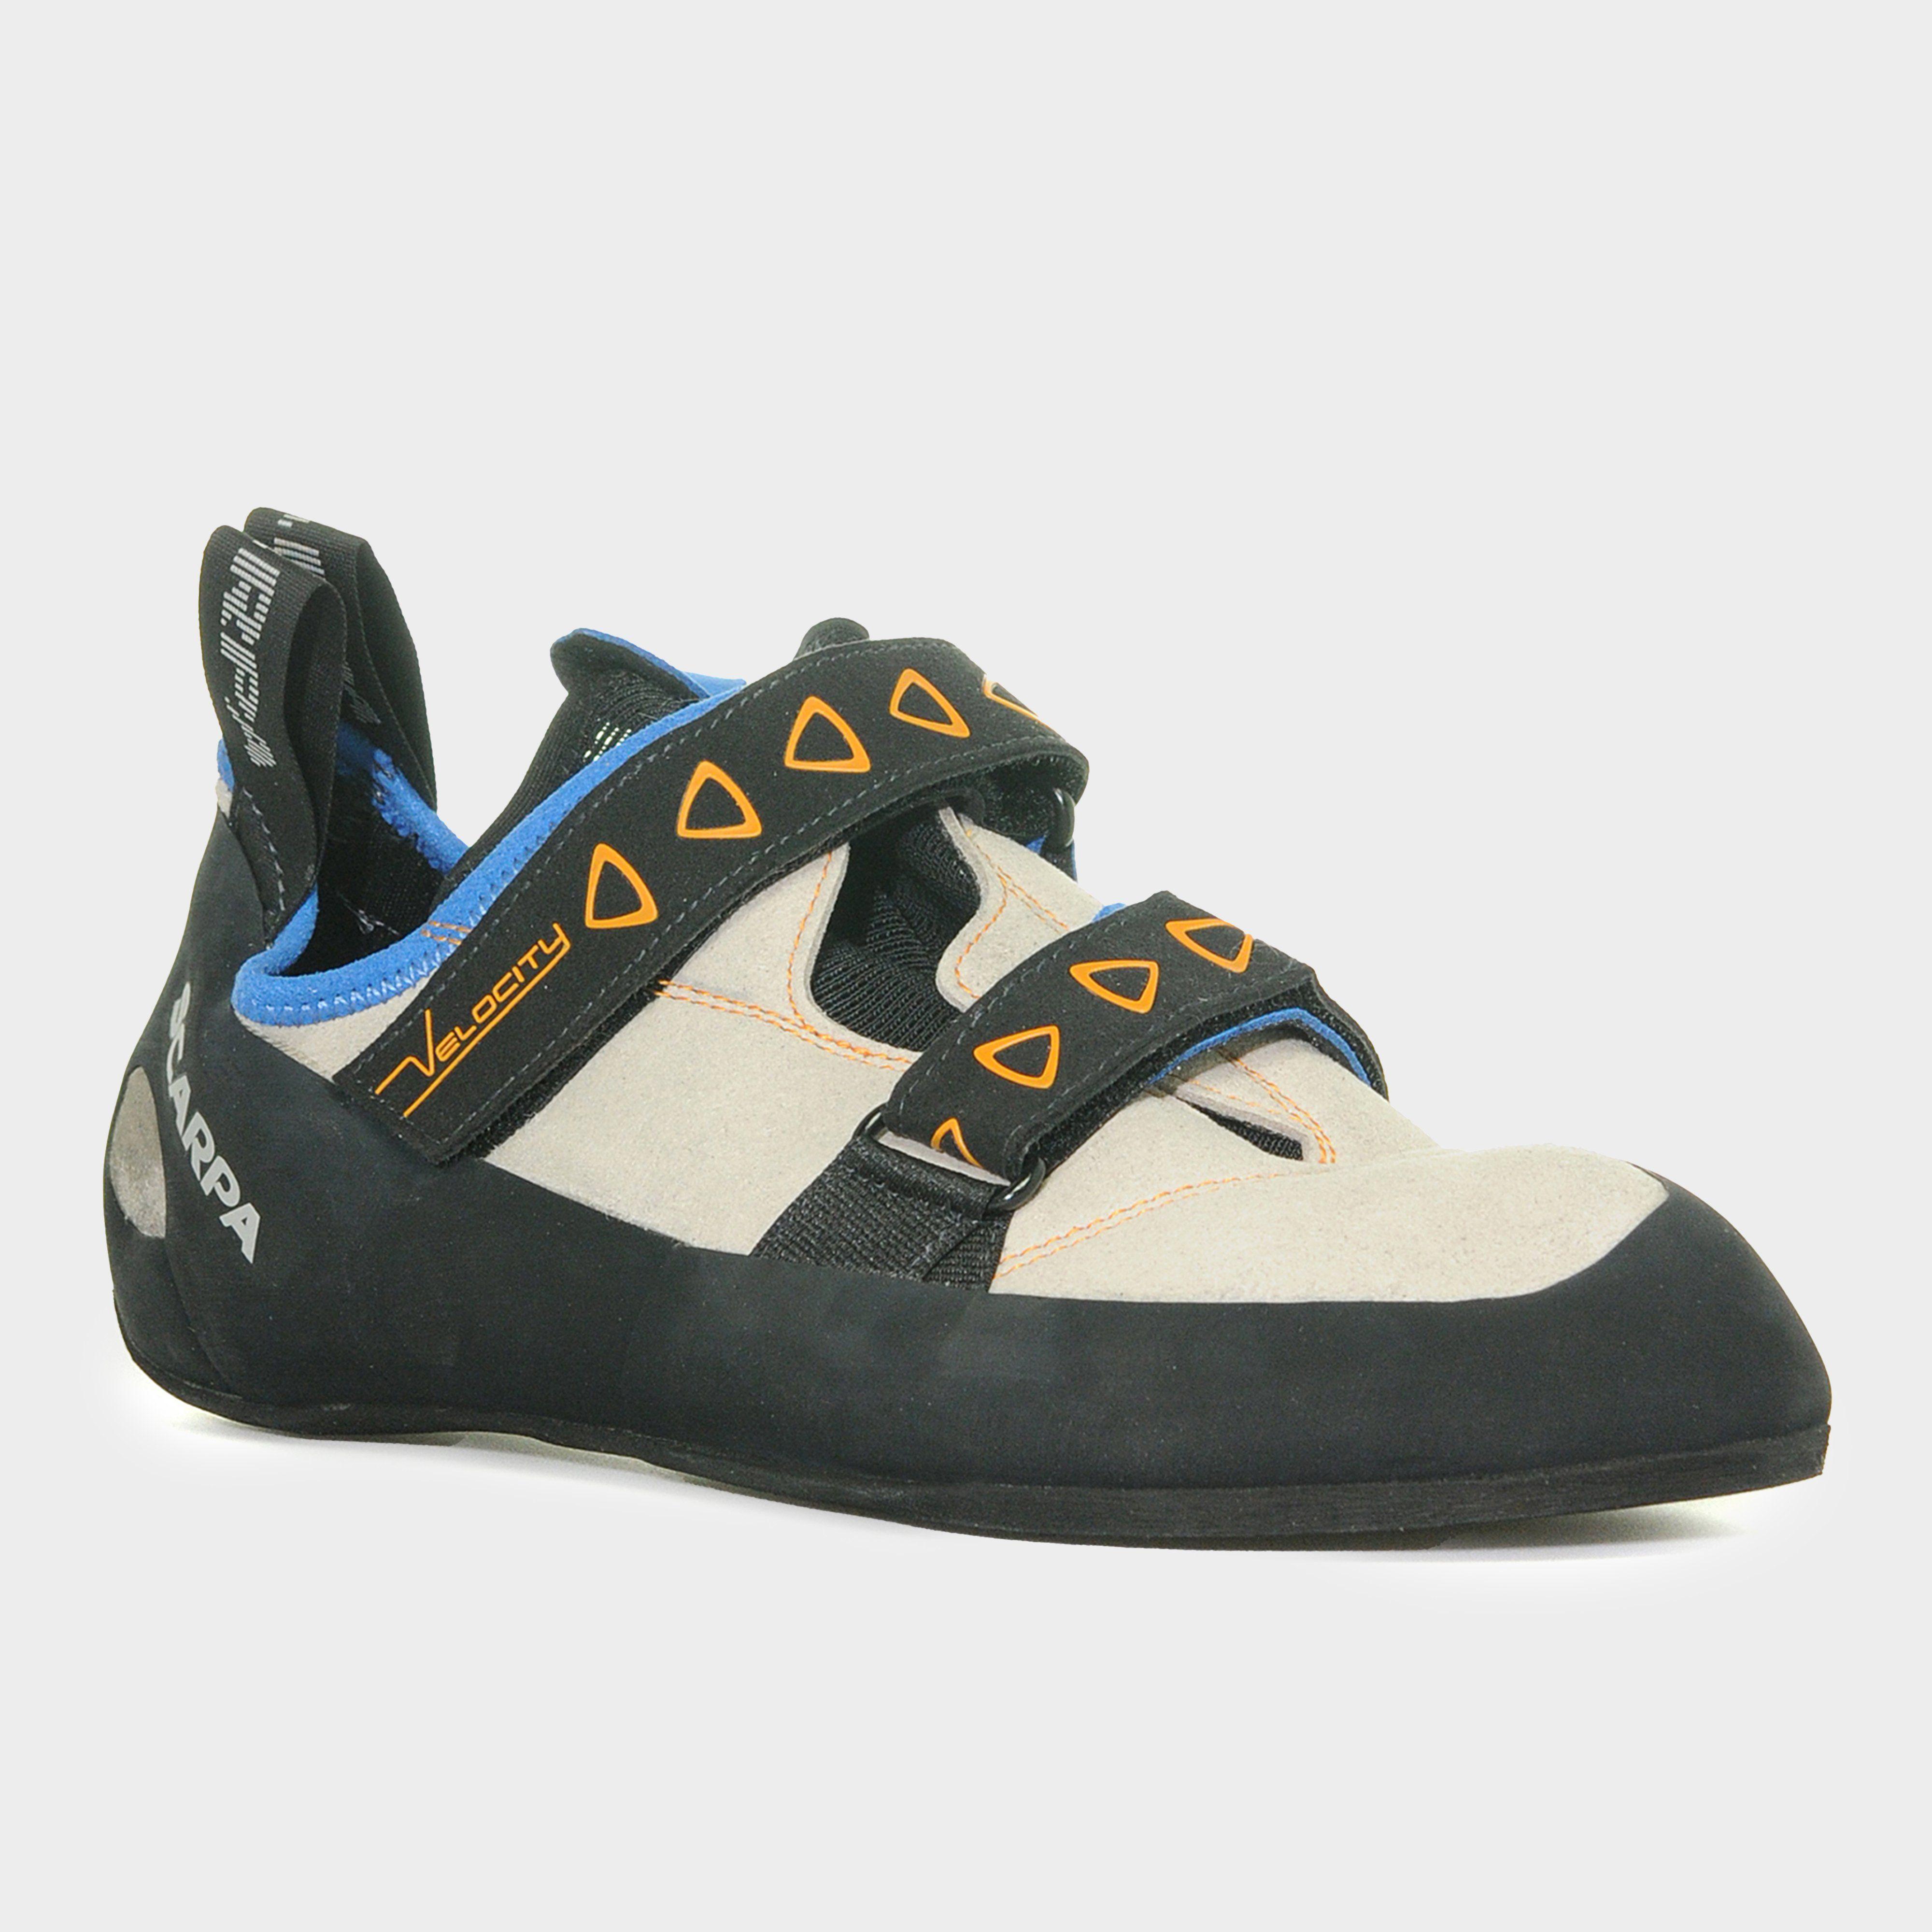 SCARPA Velocity V Climbing Shoe